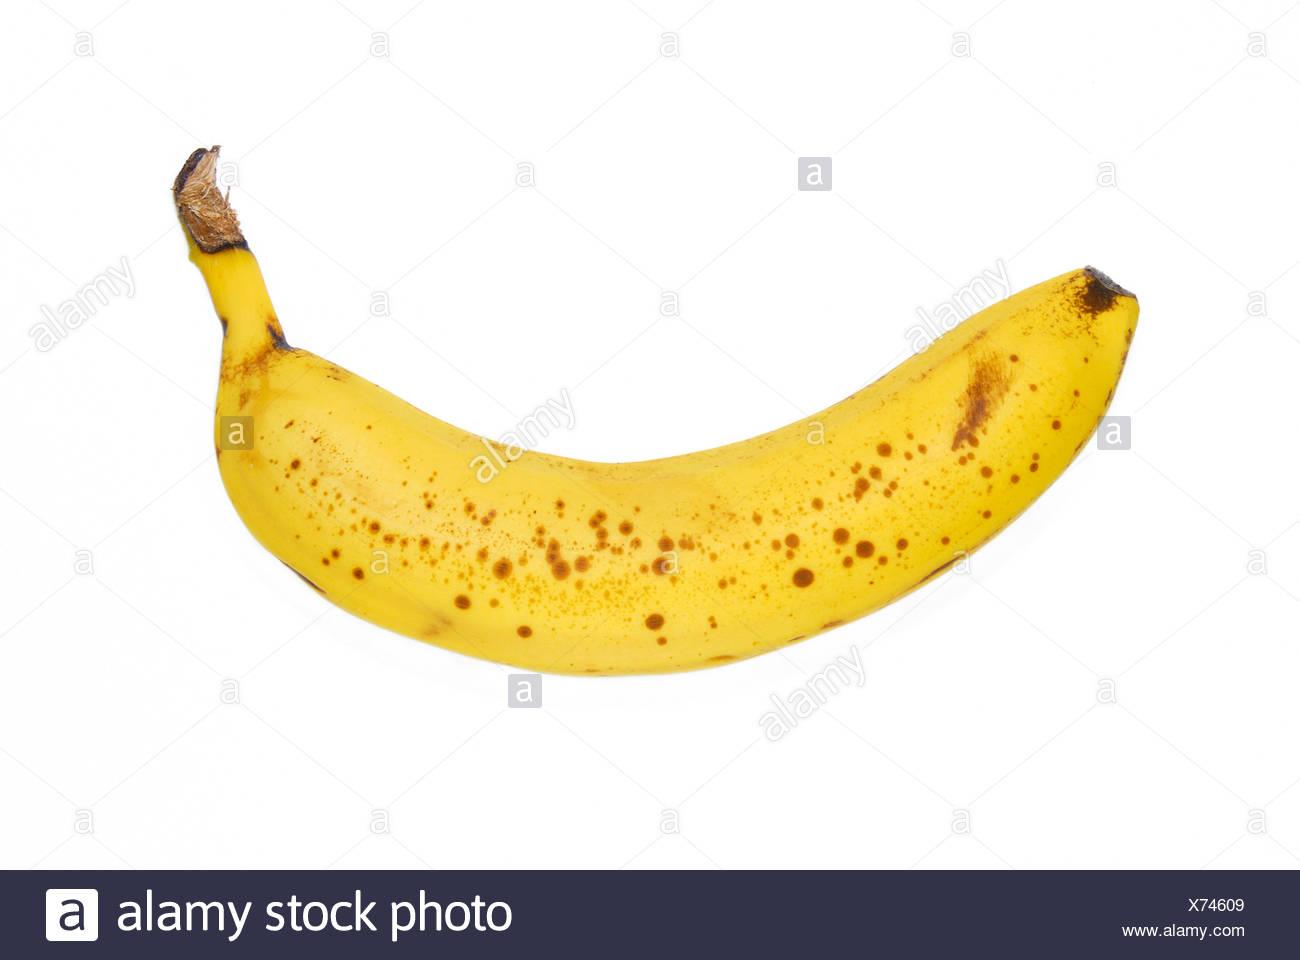 Ripe banana - Stock Image